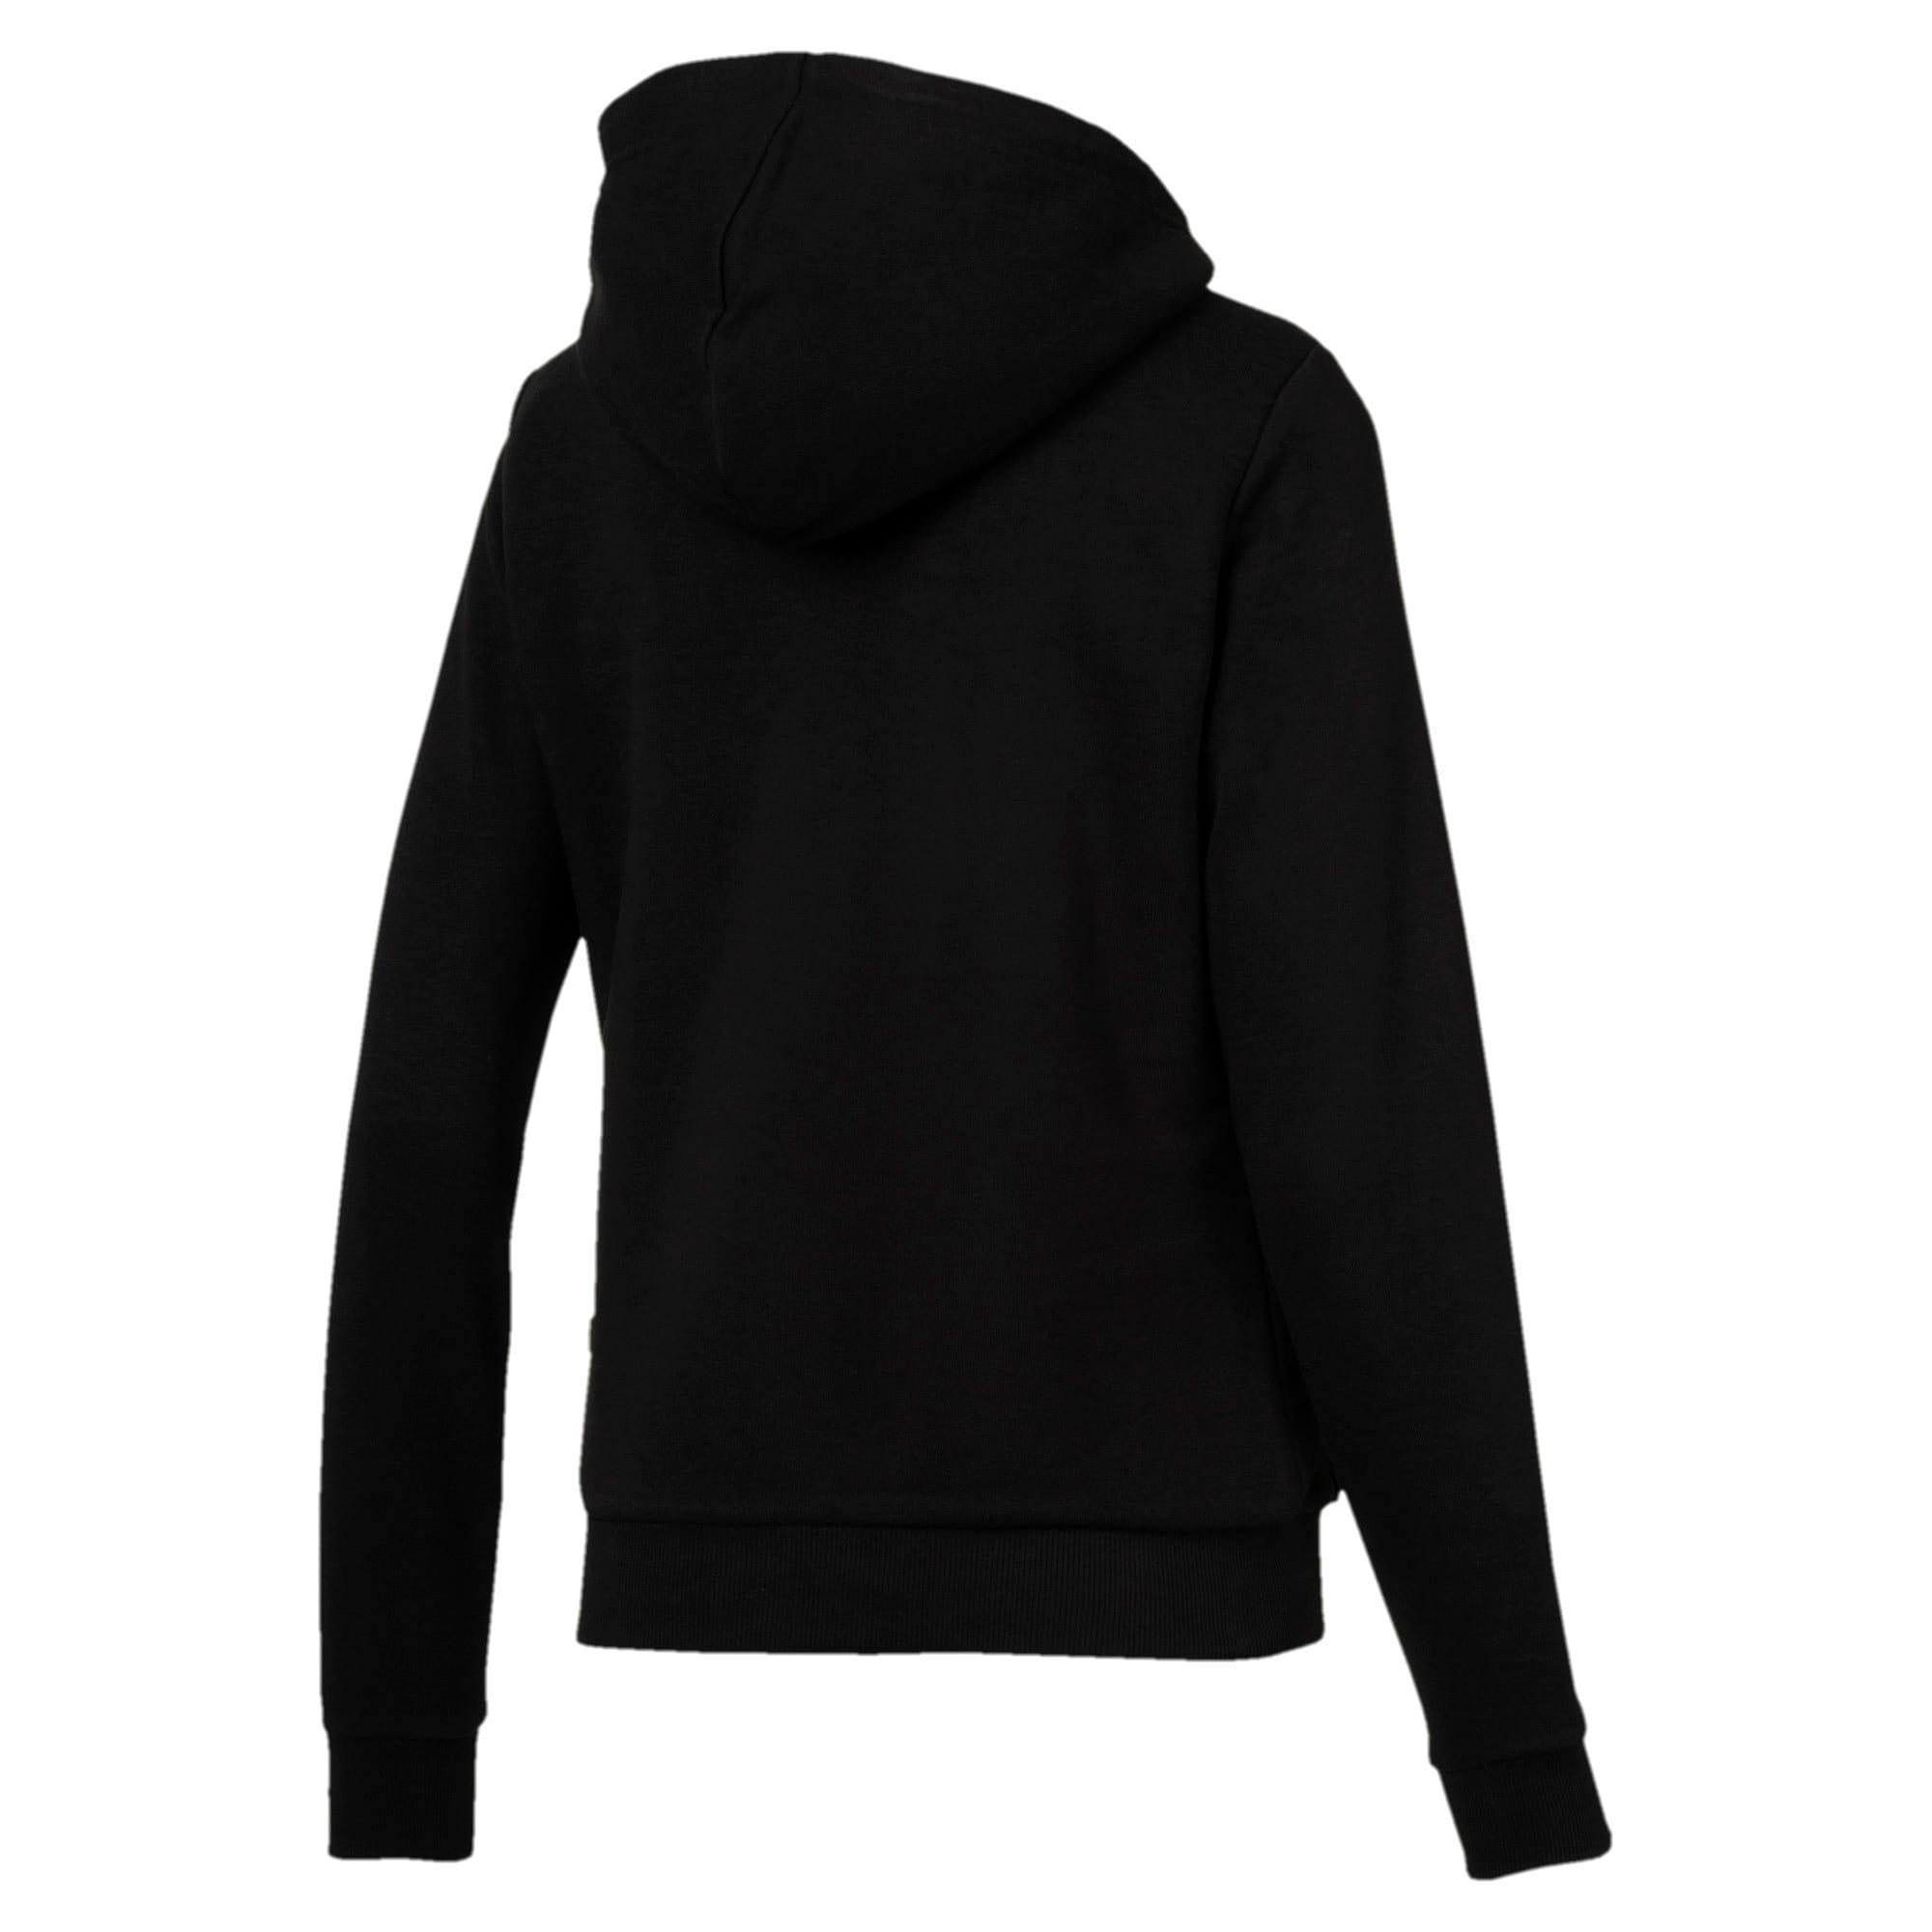 Thumbnail 5 of Essentials + Sherpa Women's Hooded Jacket, Cotton Black, medium